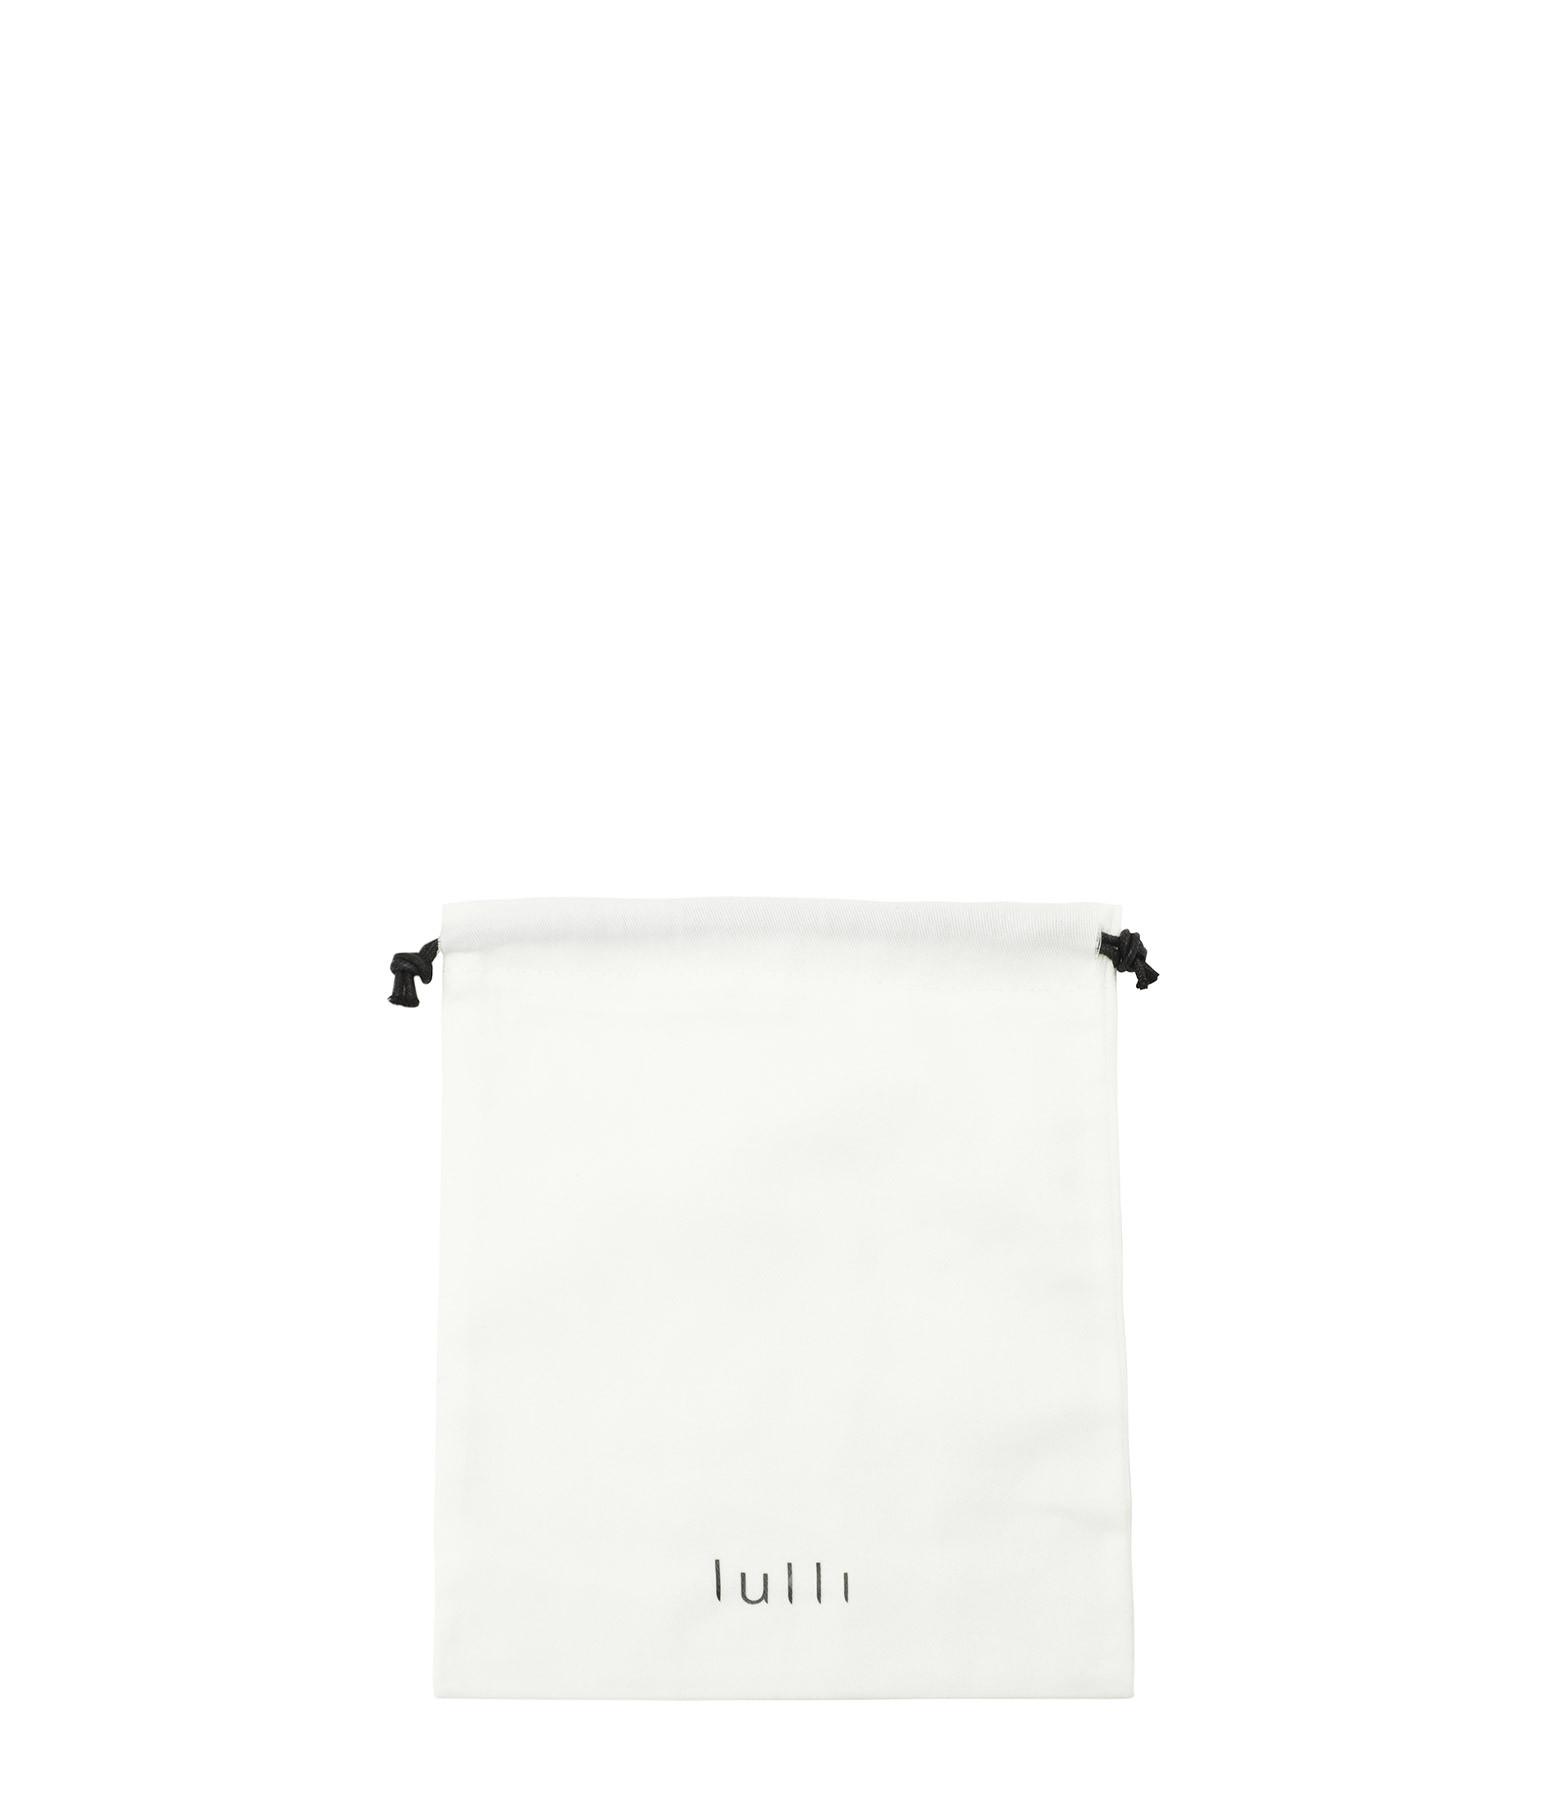 LULLI - Pochette Coton 21x25cm Imrpimé Lulli